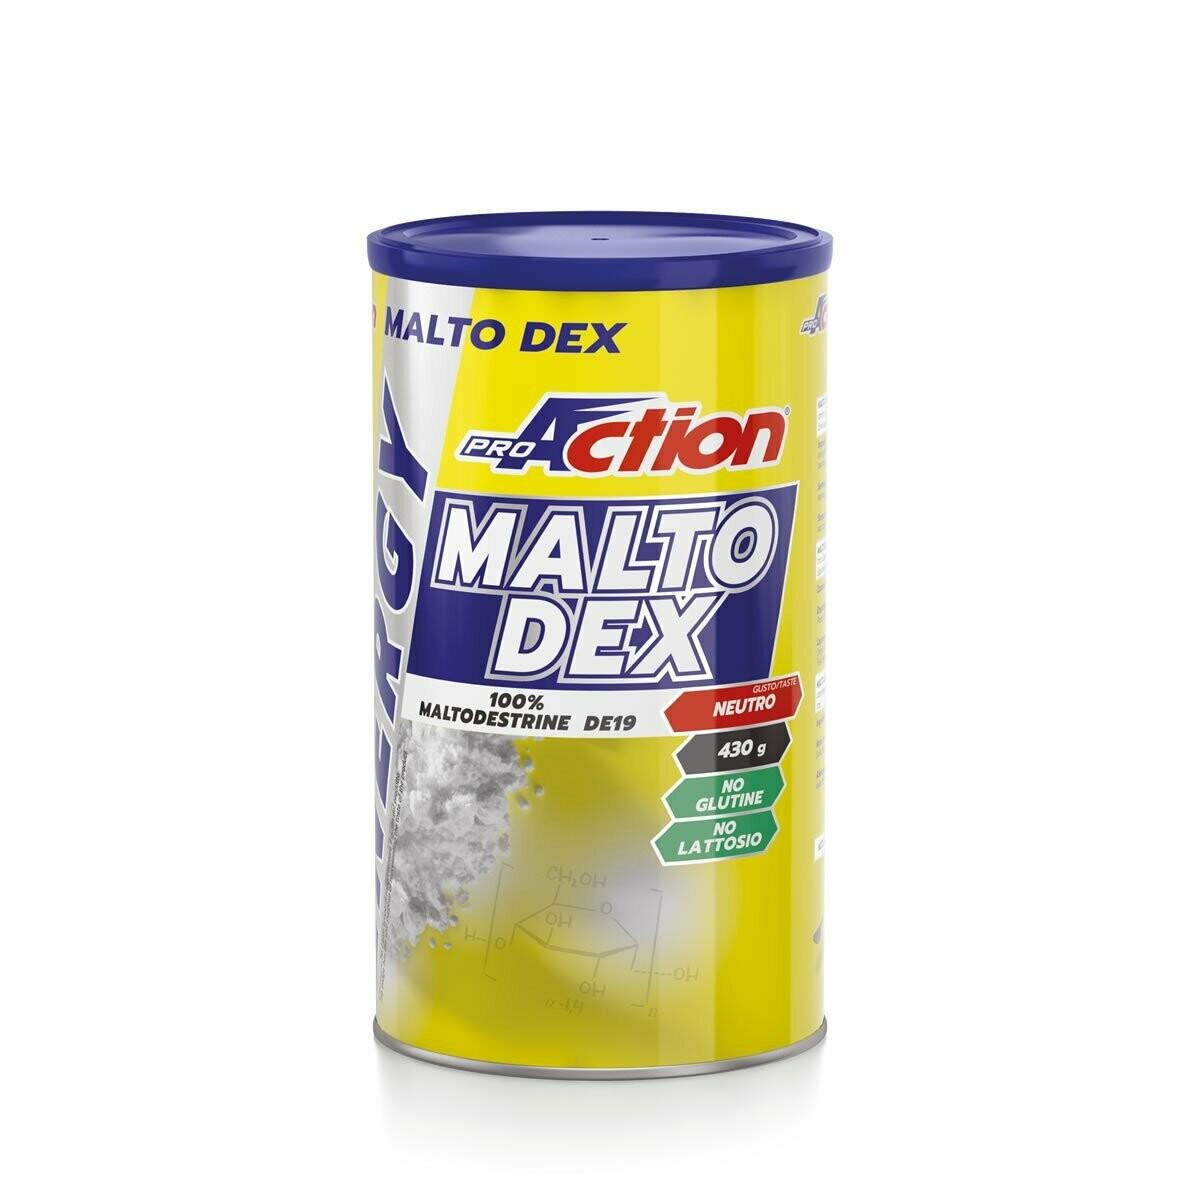 Maltodex DE19